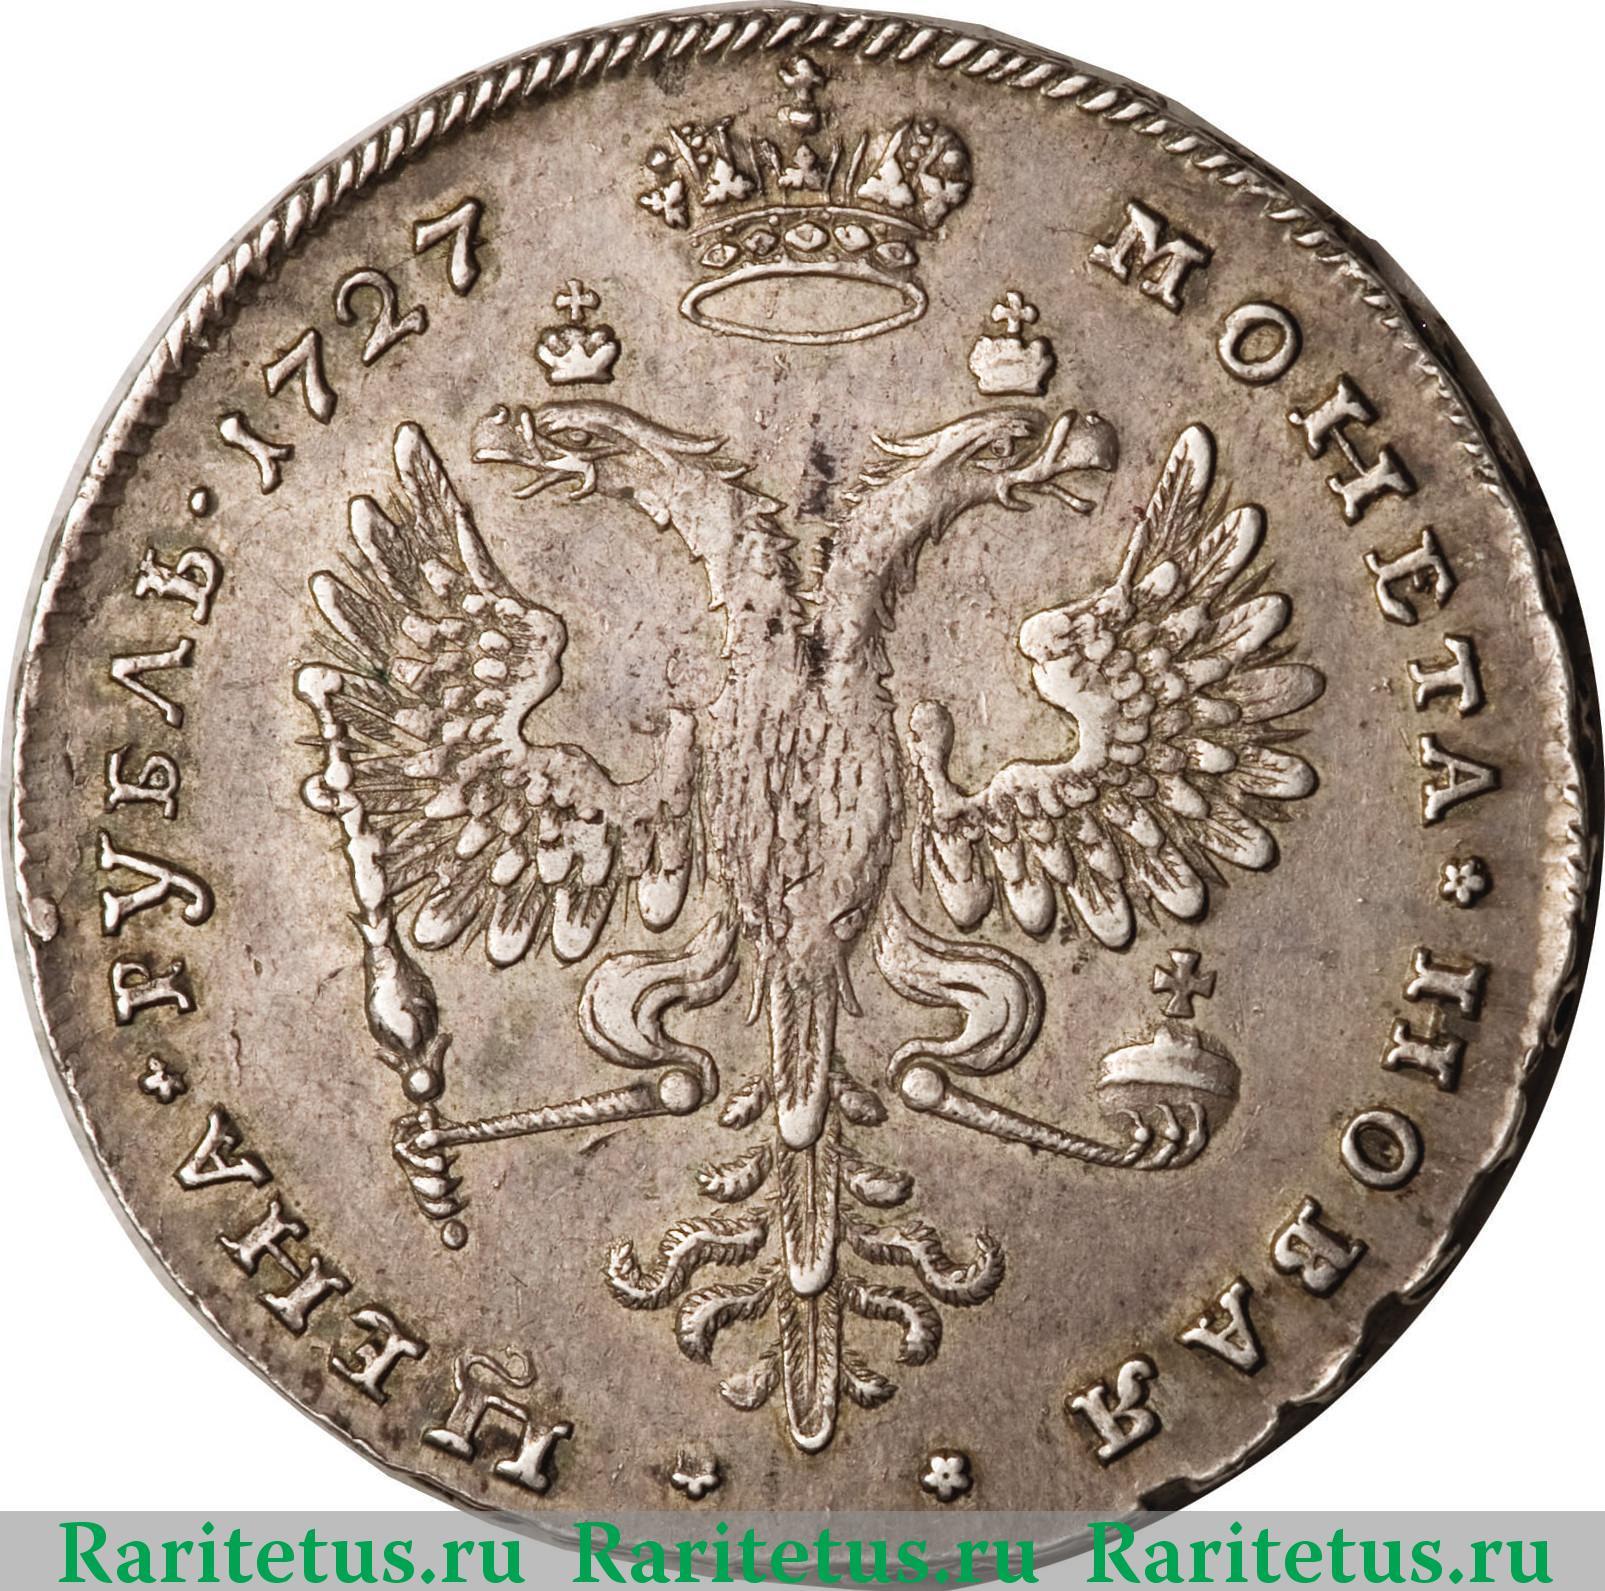 Серебряная монета 1 рубль 1727 екатерина 25000 драмм 1997 золото цена